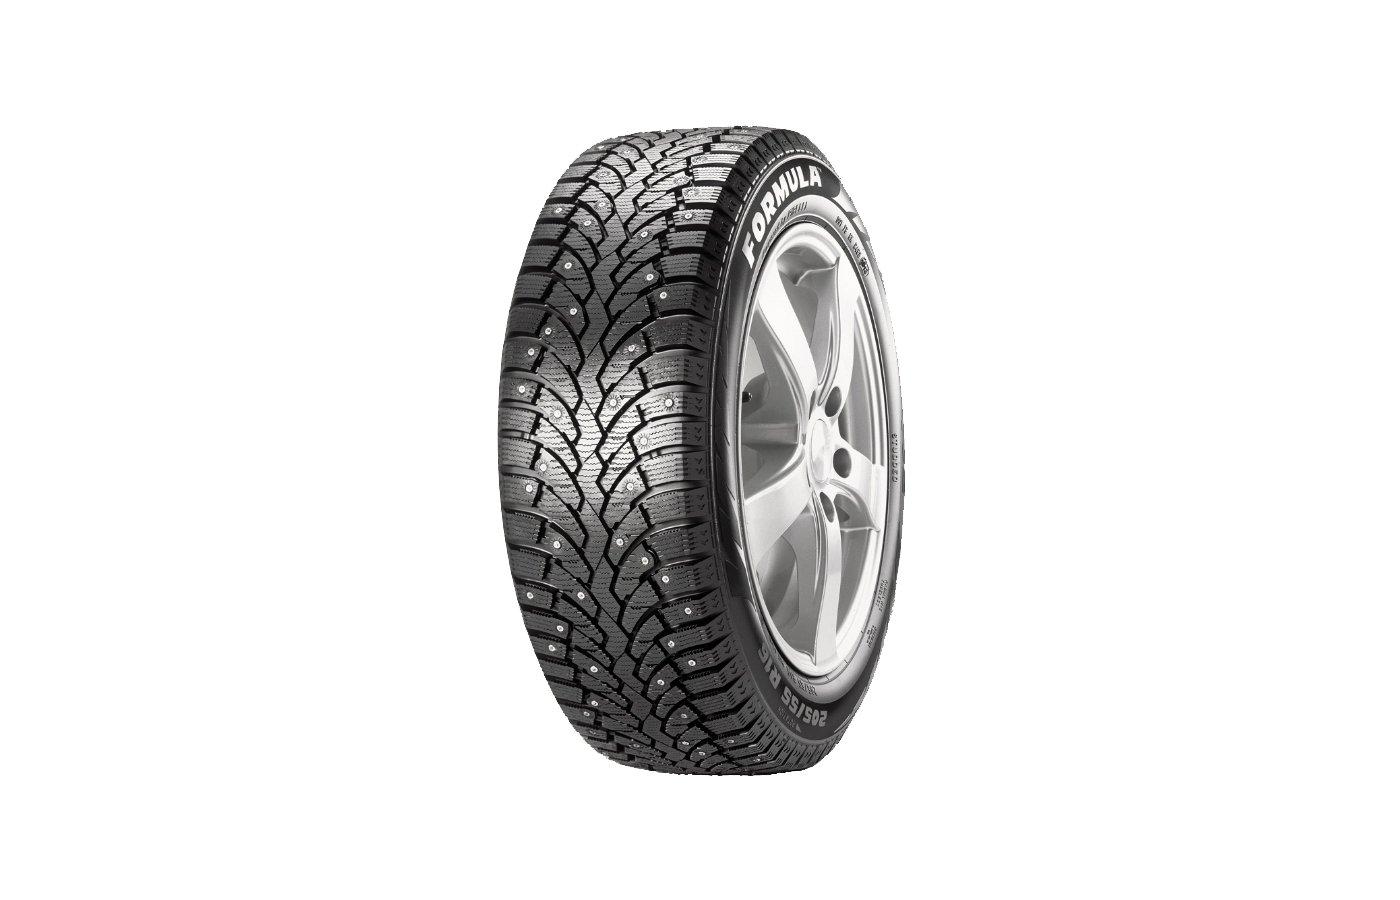 Шина Pirelli Formula Ice 195/55 R15 TL 85T шип